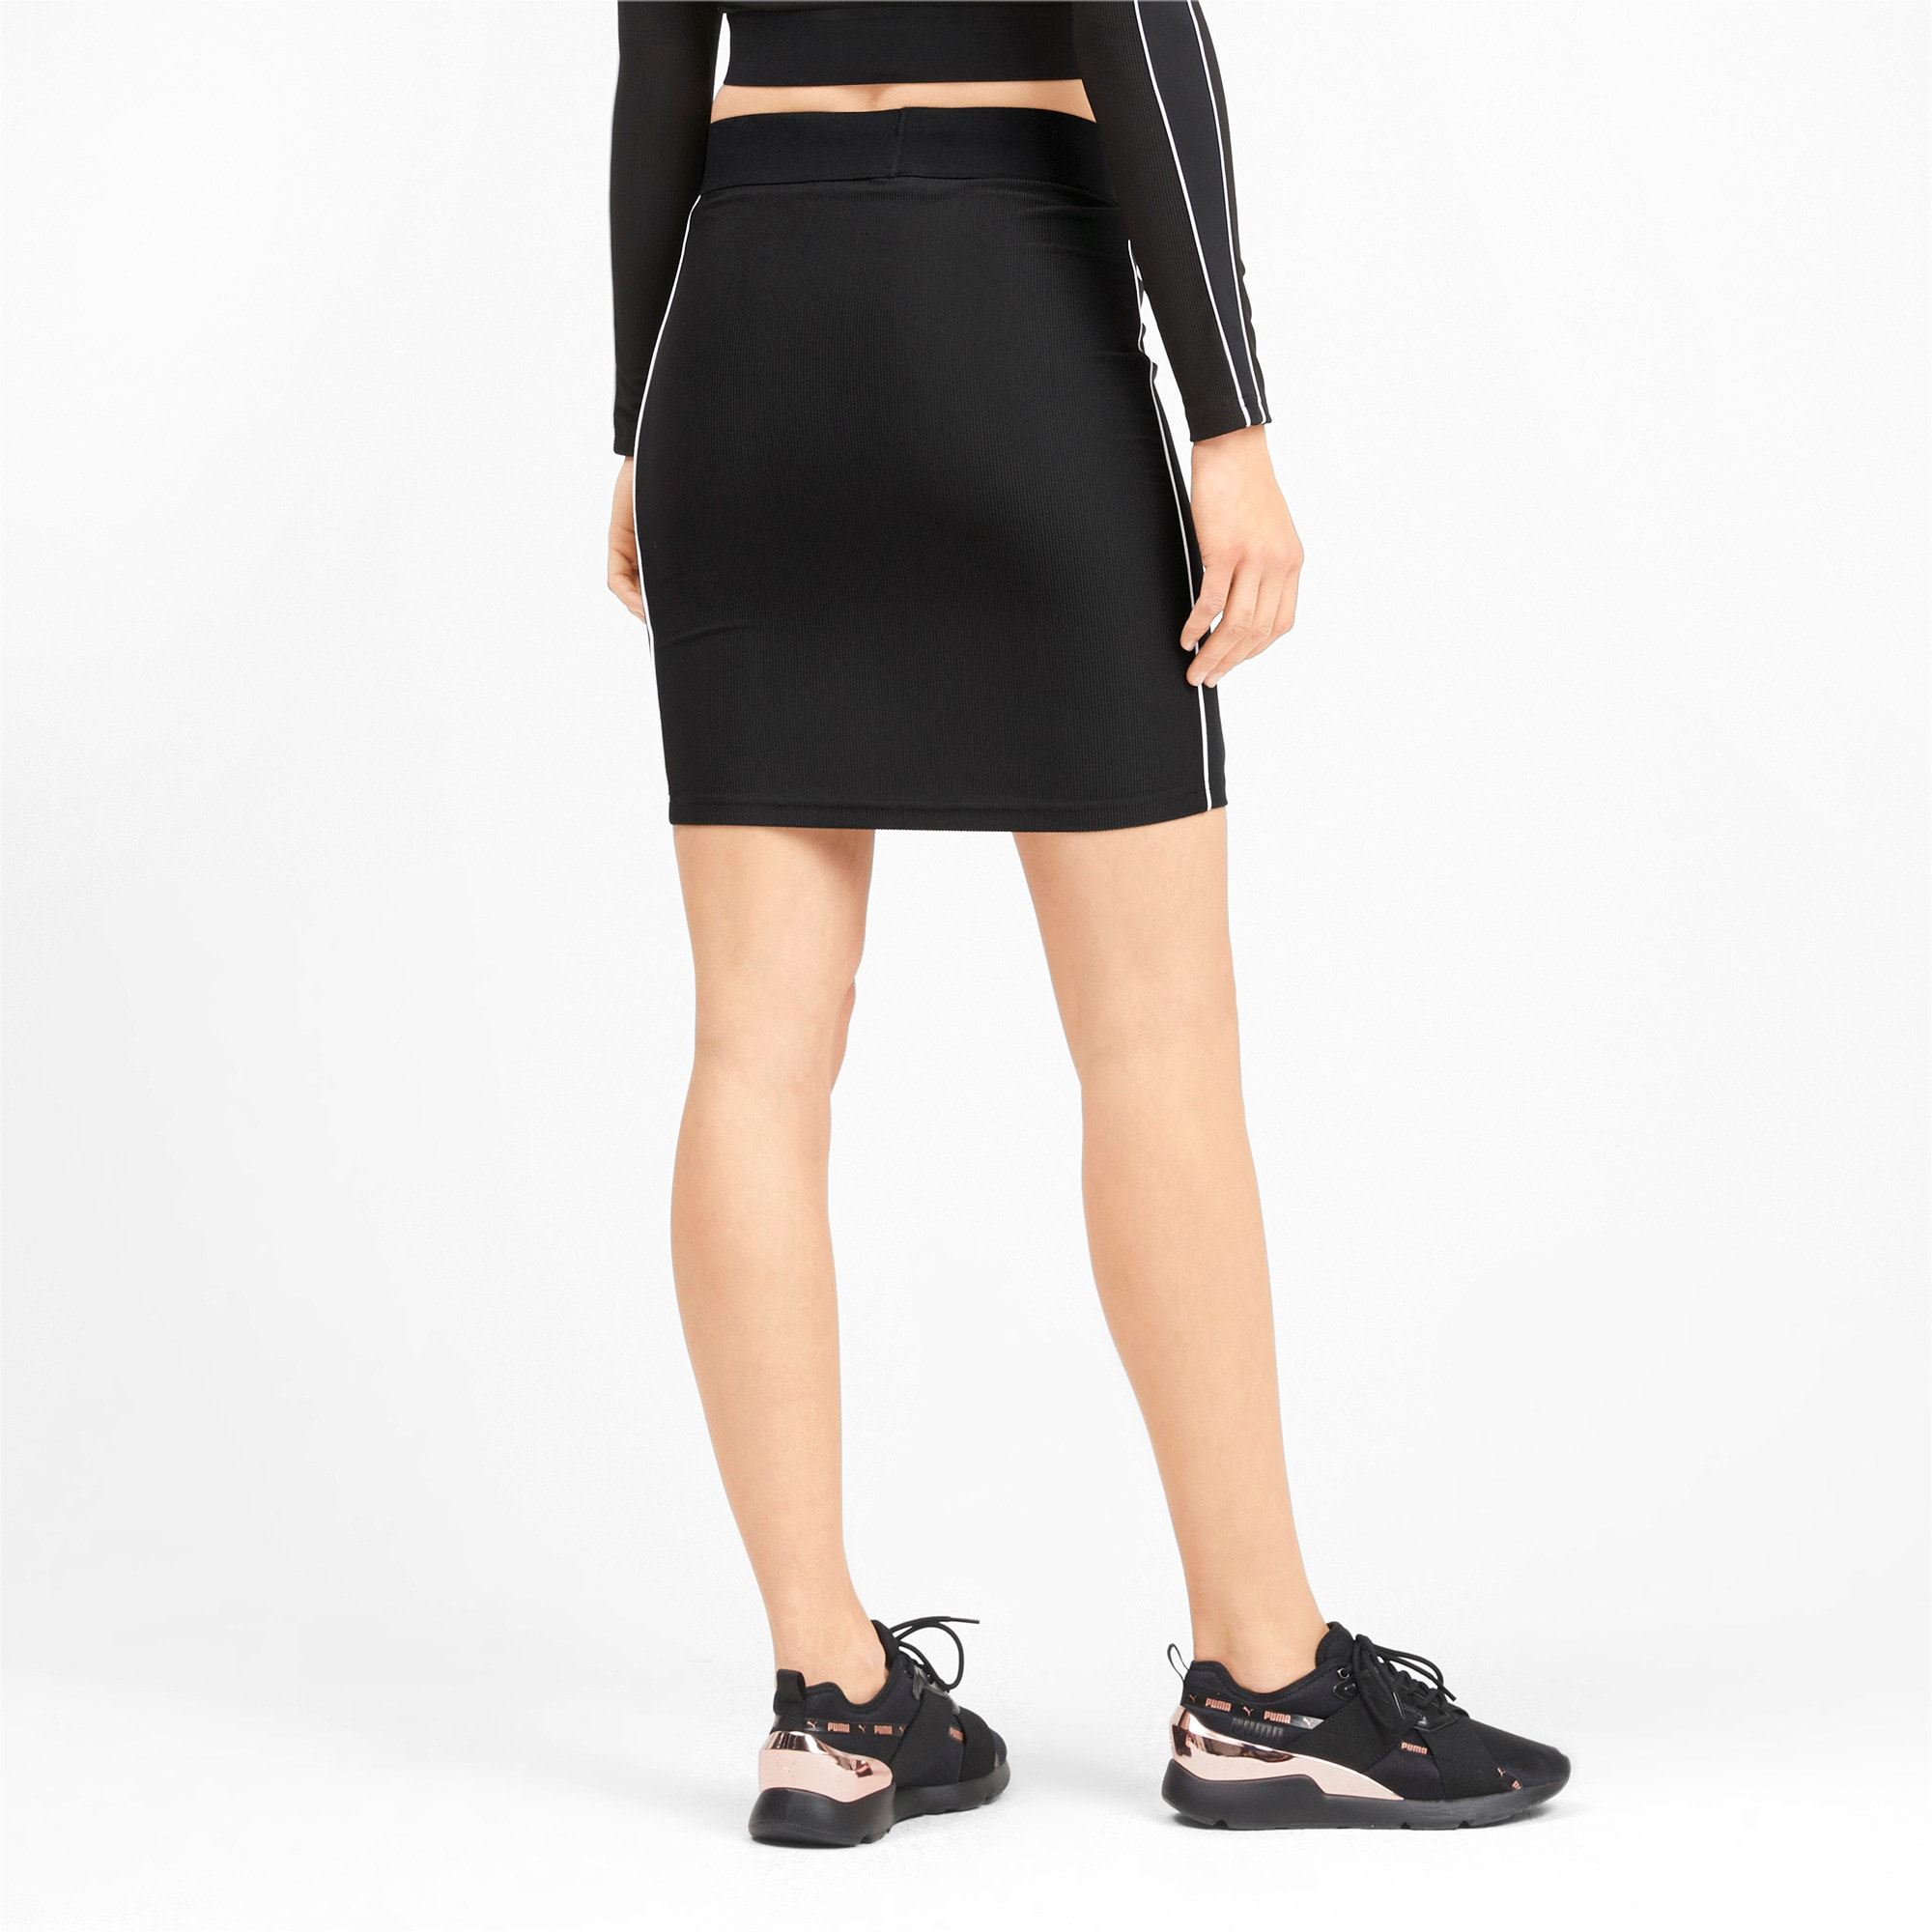 Miniatura 2 de Falda Classicscon cordoncillo para mujer, Puma Black, mediano